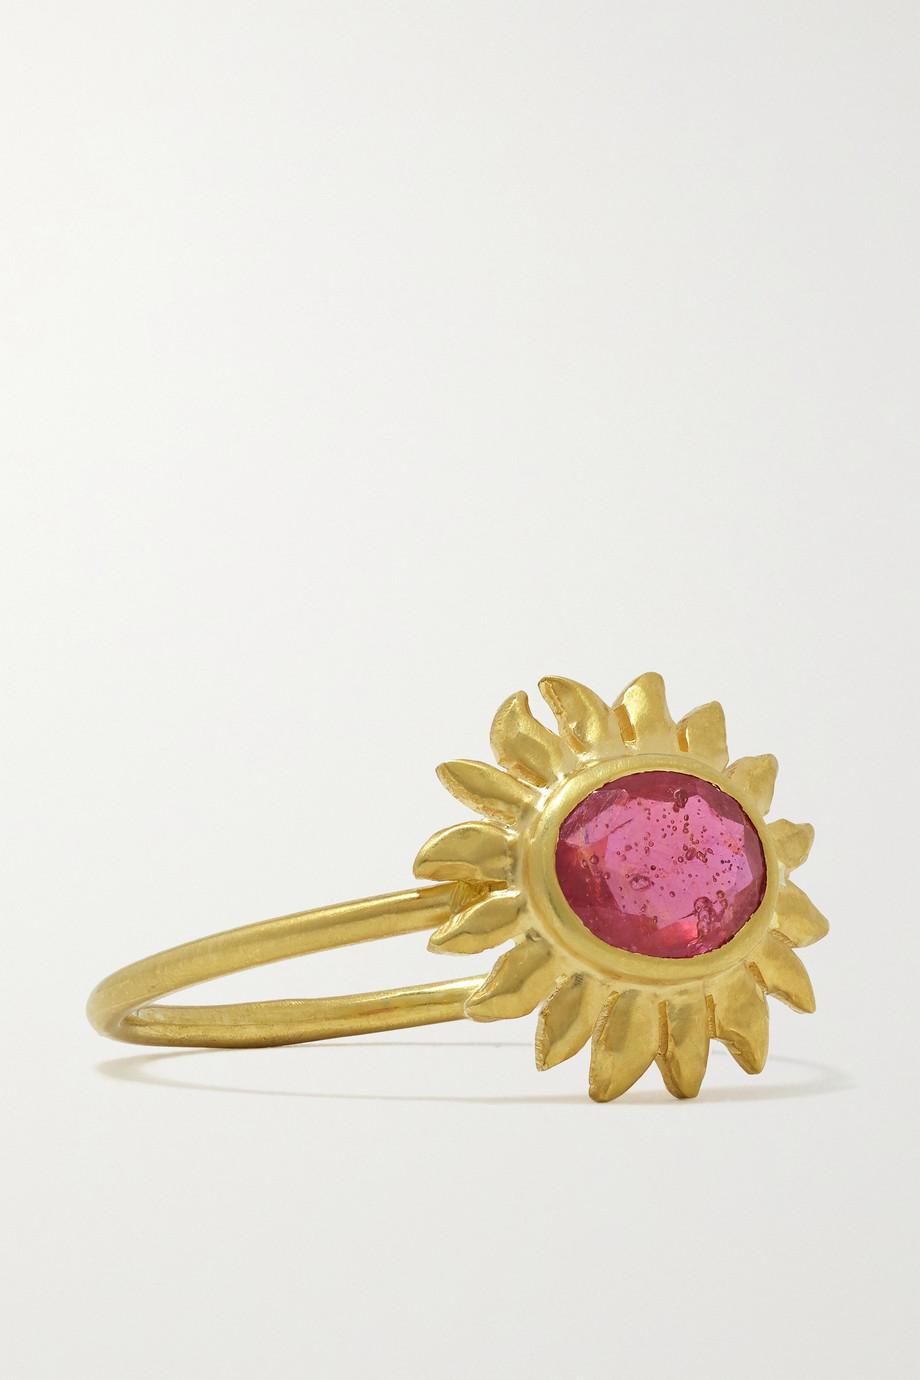 Pippa Small Hello Sunshine 18-karat gold ruby ring